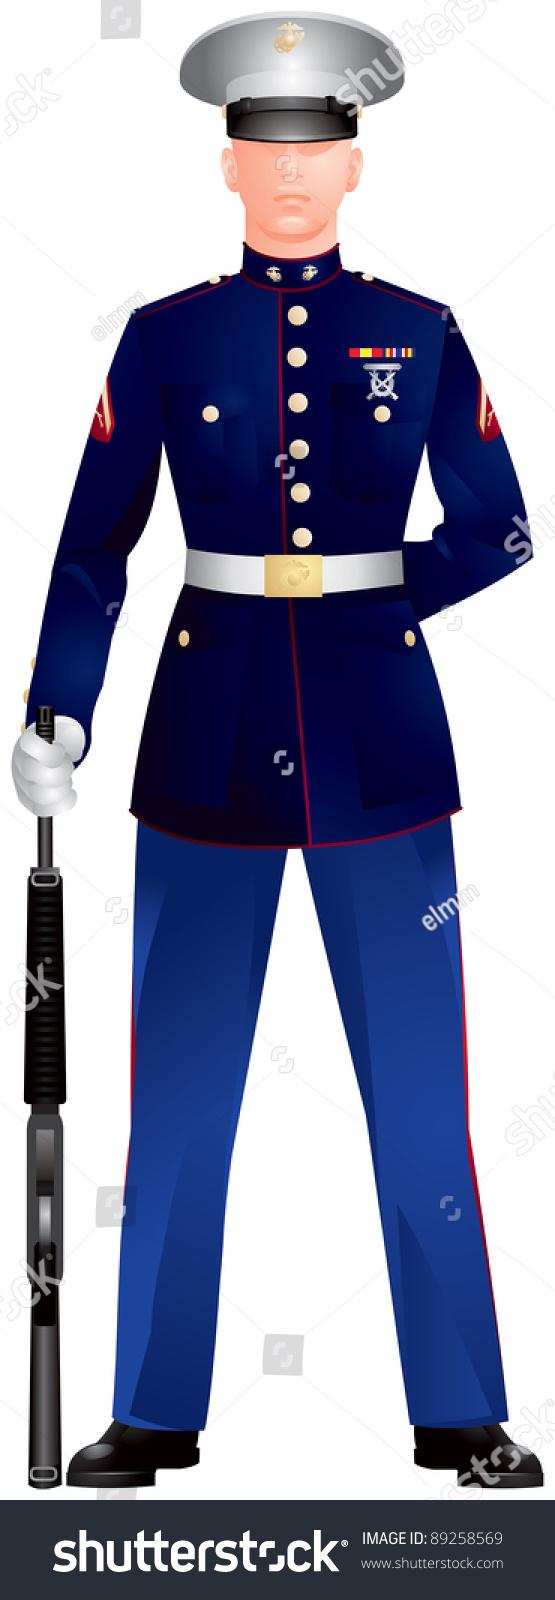 us marine corp blue dress uniform stock vector 89258569 us navy logo vector free official us navy logo vector